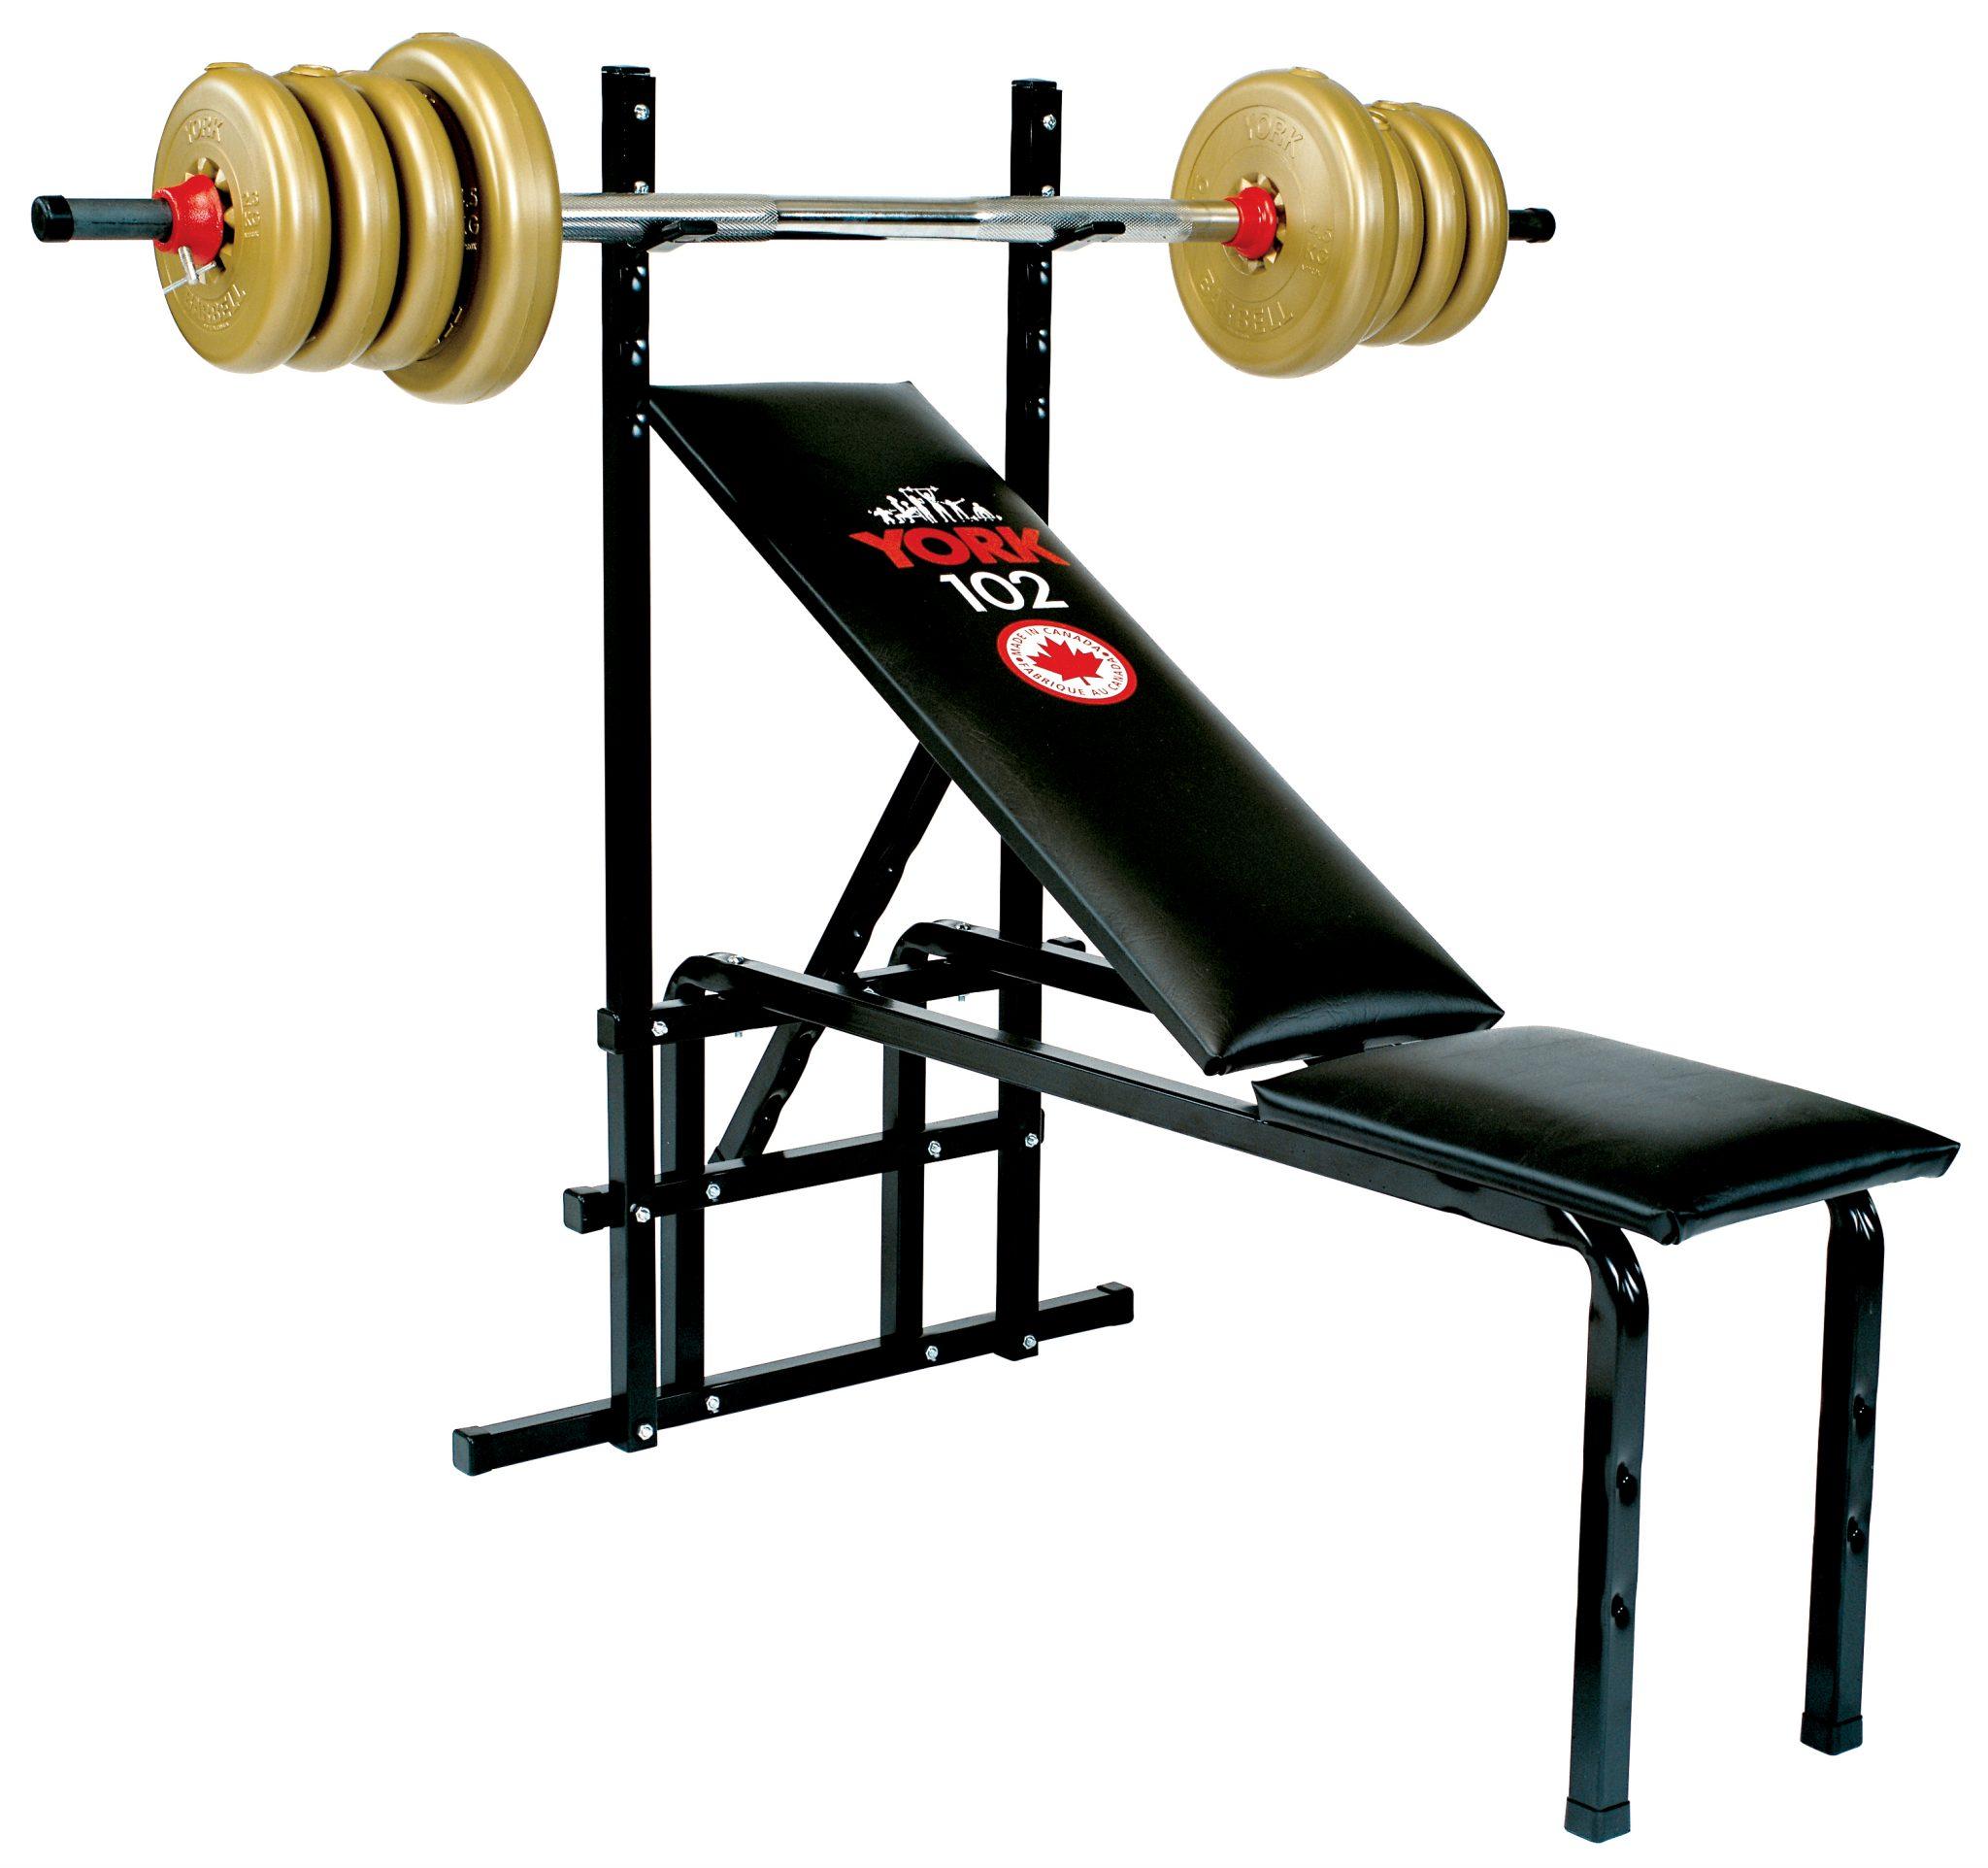 102 Adjustable Bench Press Machine Home Gym Equipment